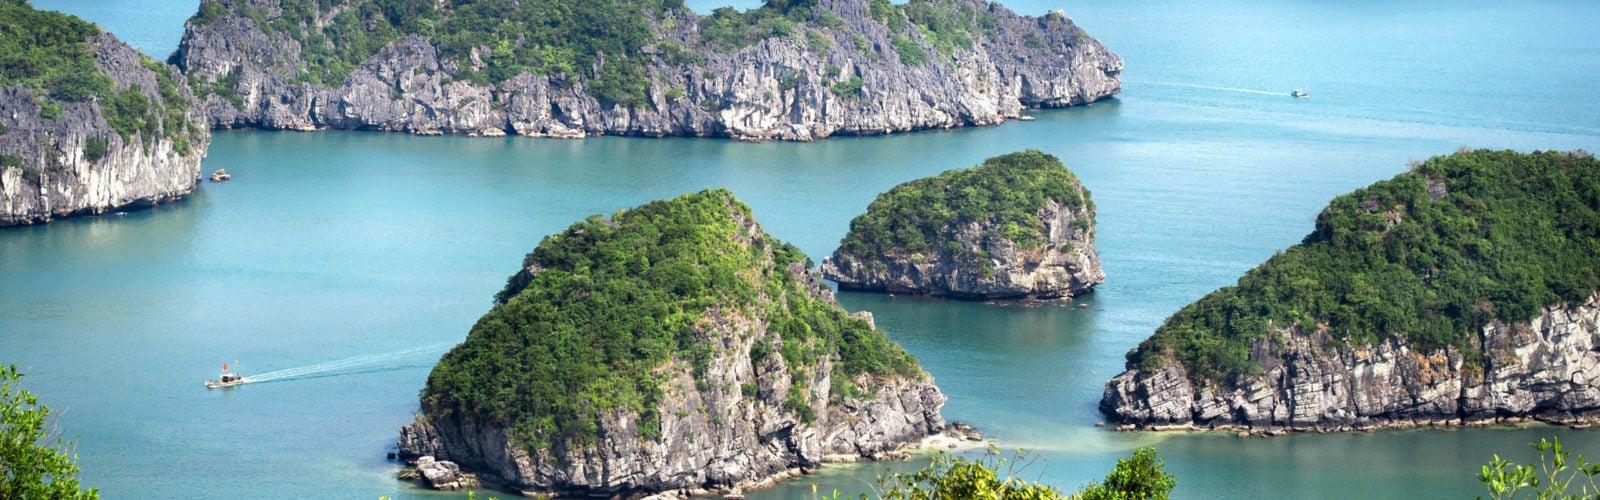 View of Halong Bay, North Vietnam.